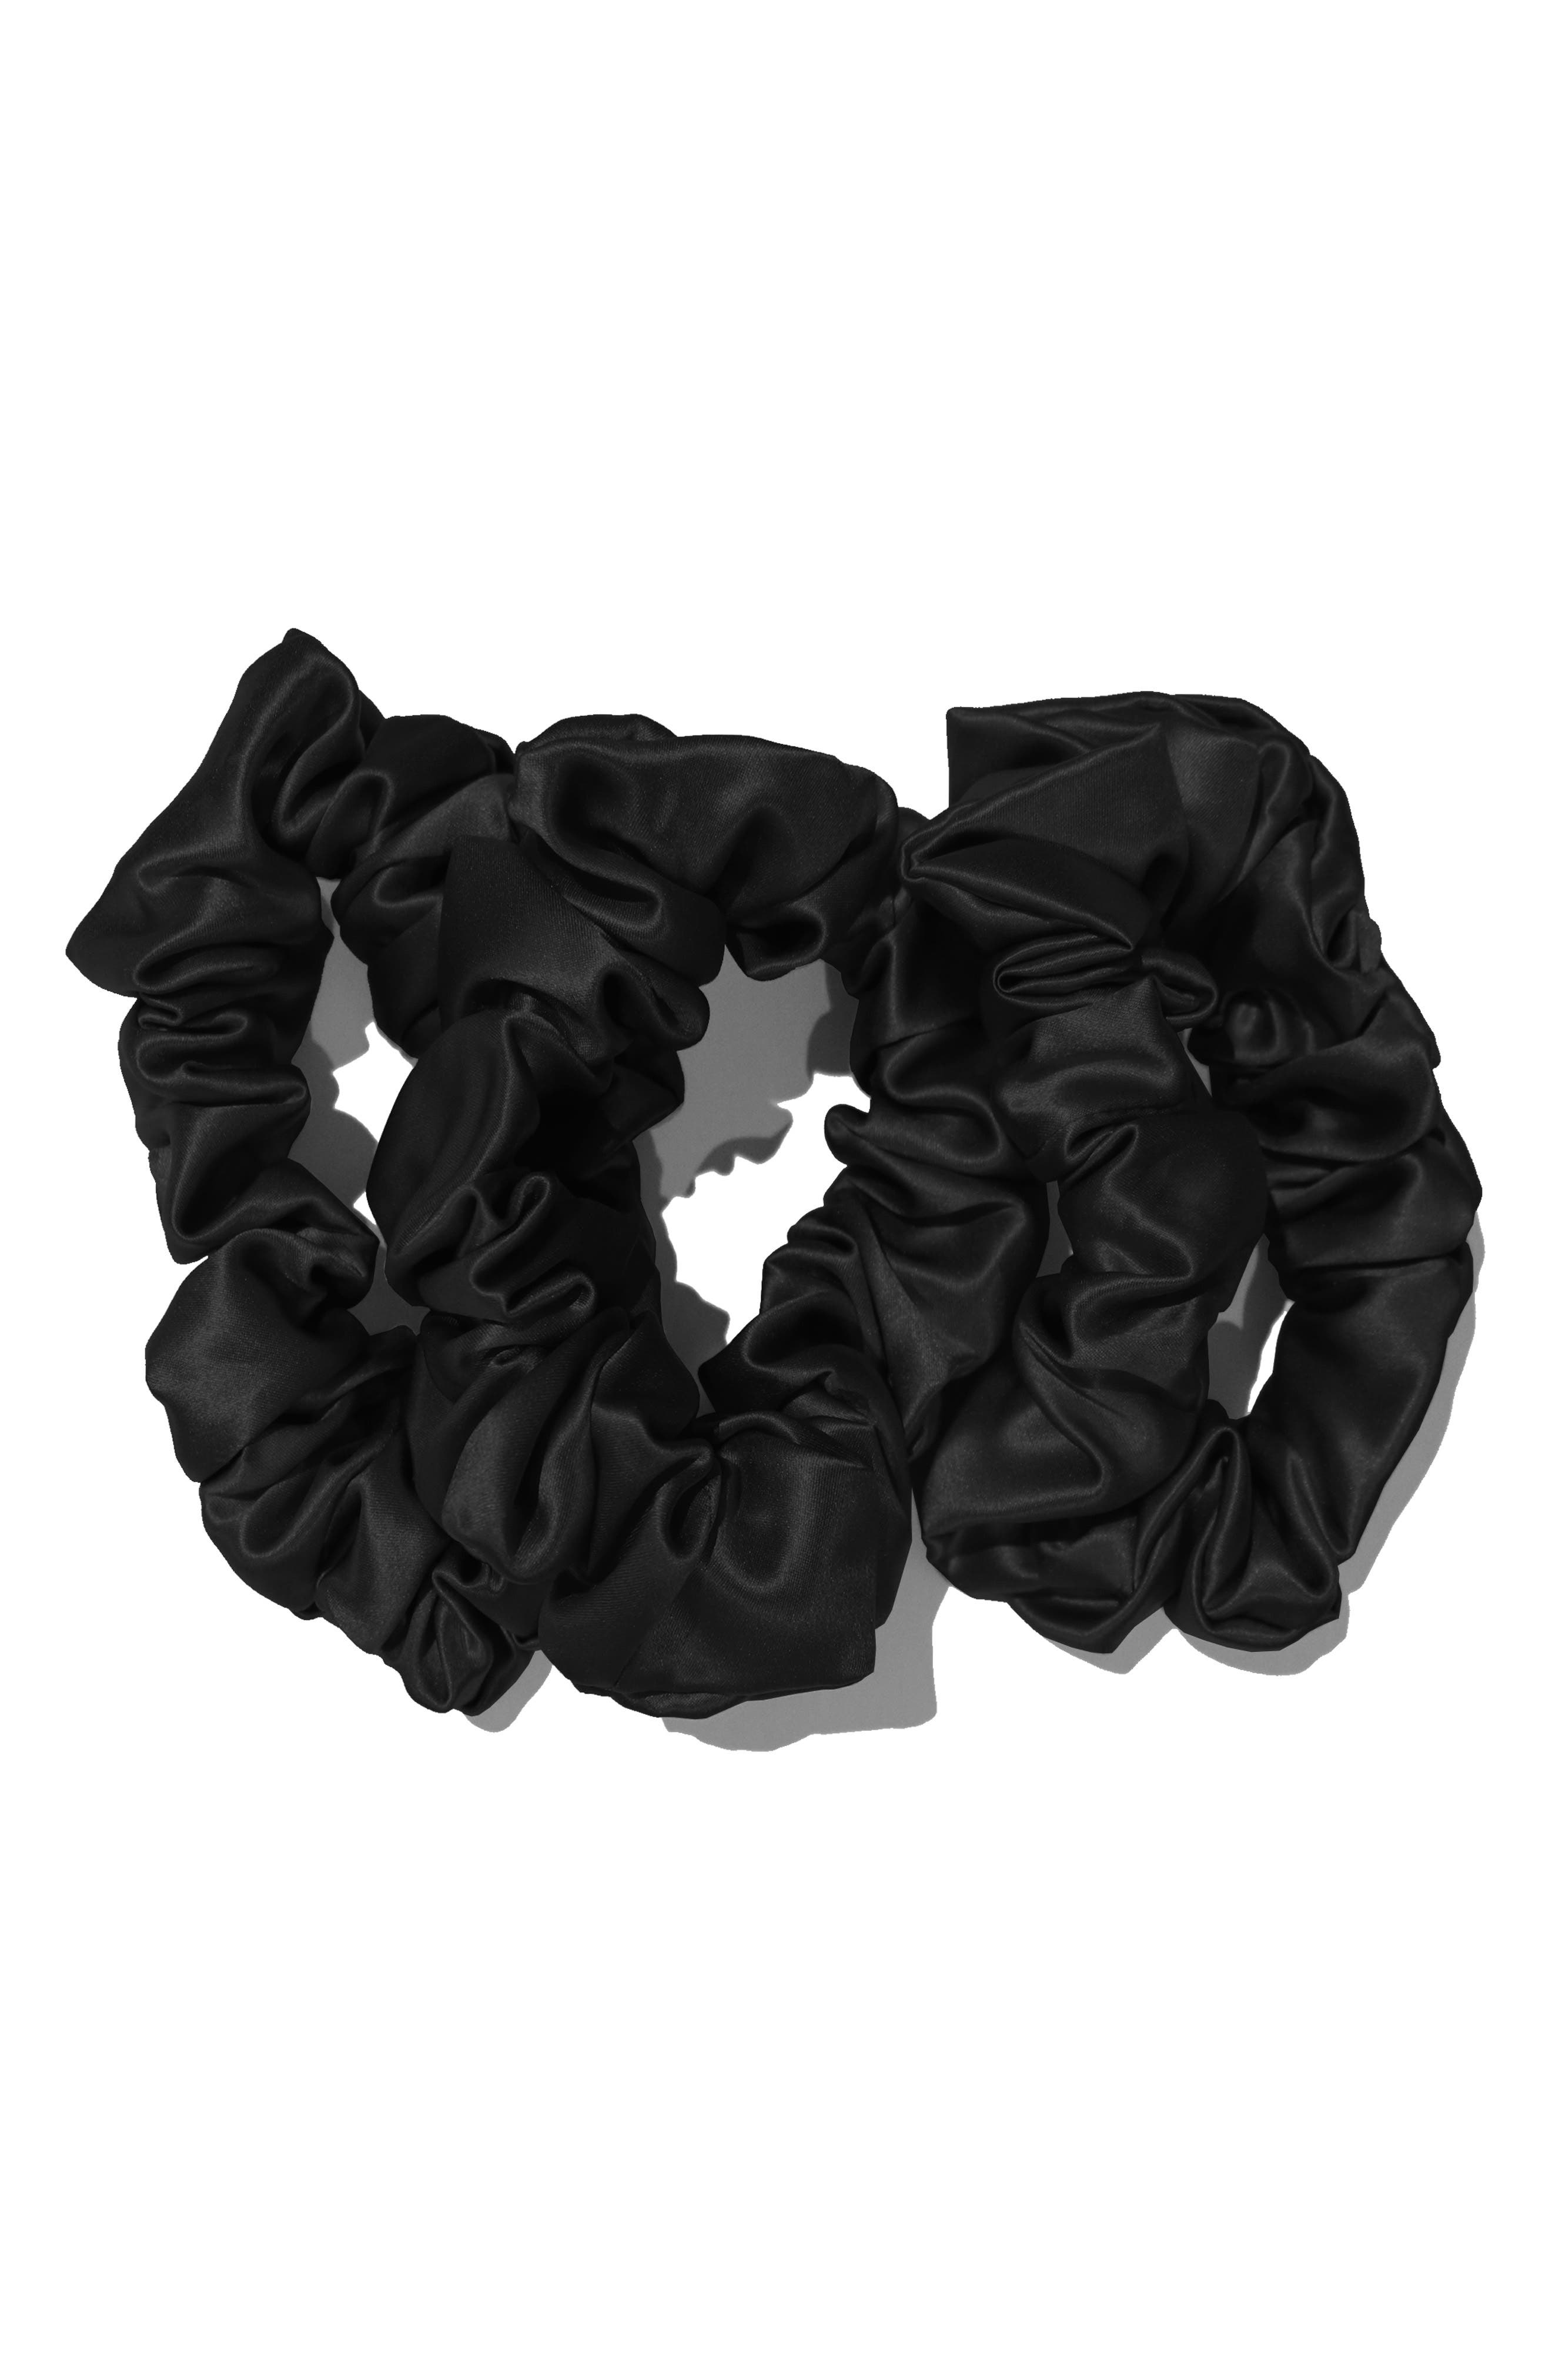 SLIP FOR BEAUTY SLEEP, slip<sup>™</sup> for beauty sleep 3-Pack Slipsilk<sup>™</sup> Hair Ties, Main thumbnail 1, color, BLACK